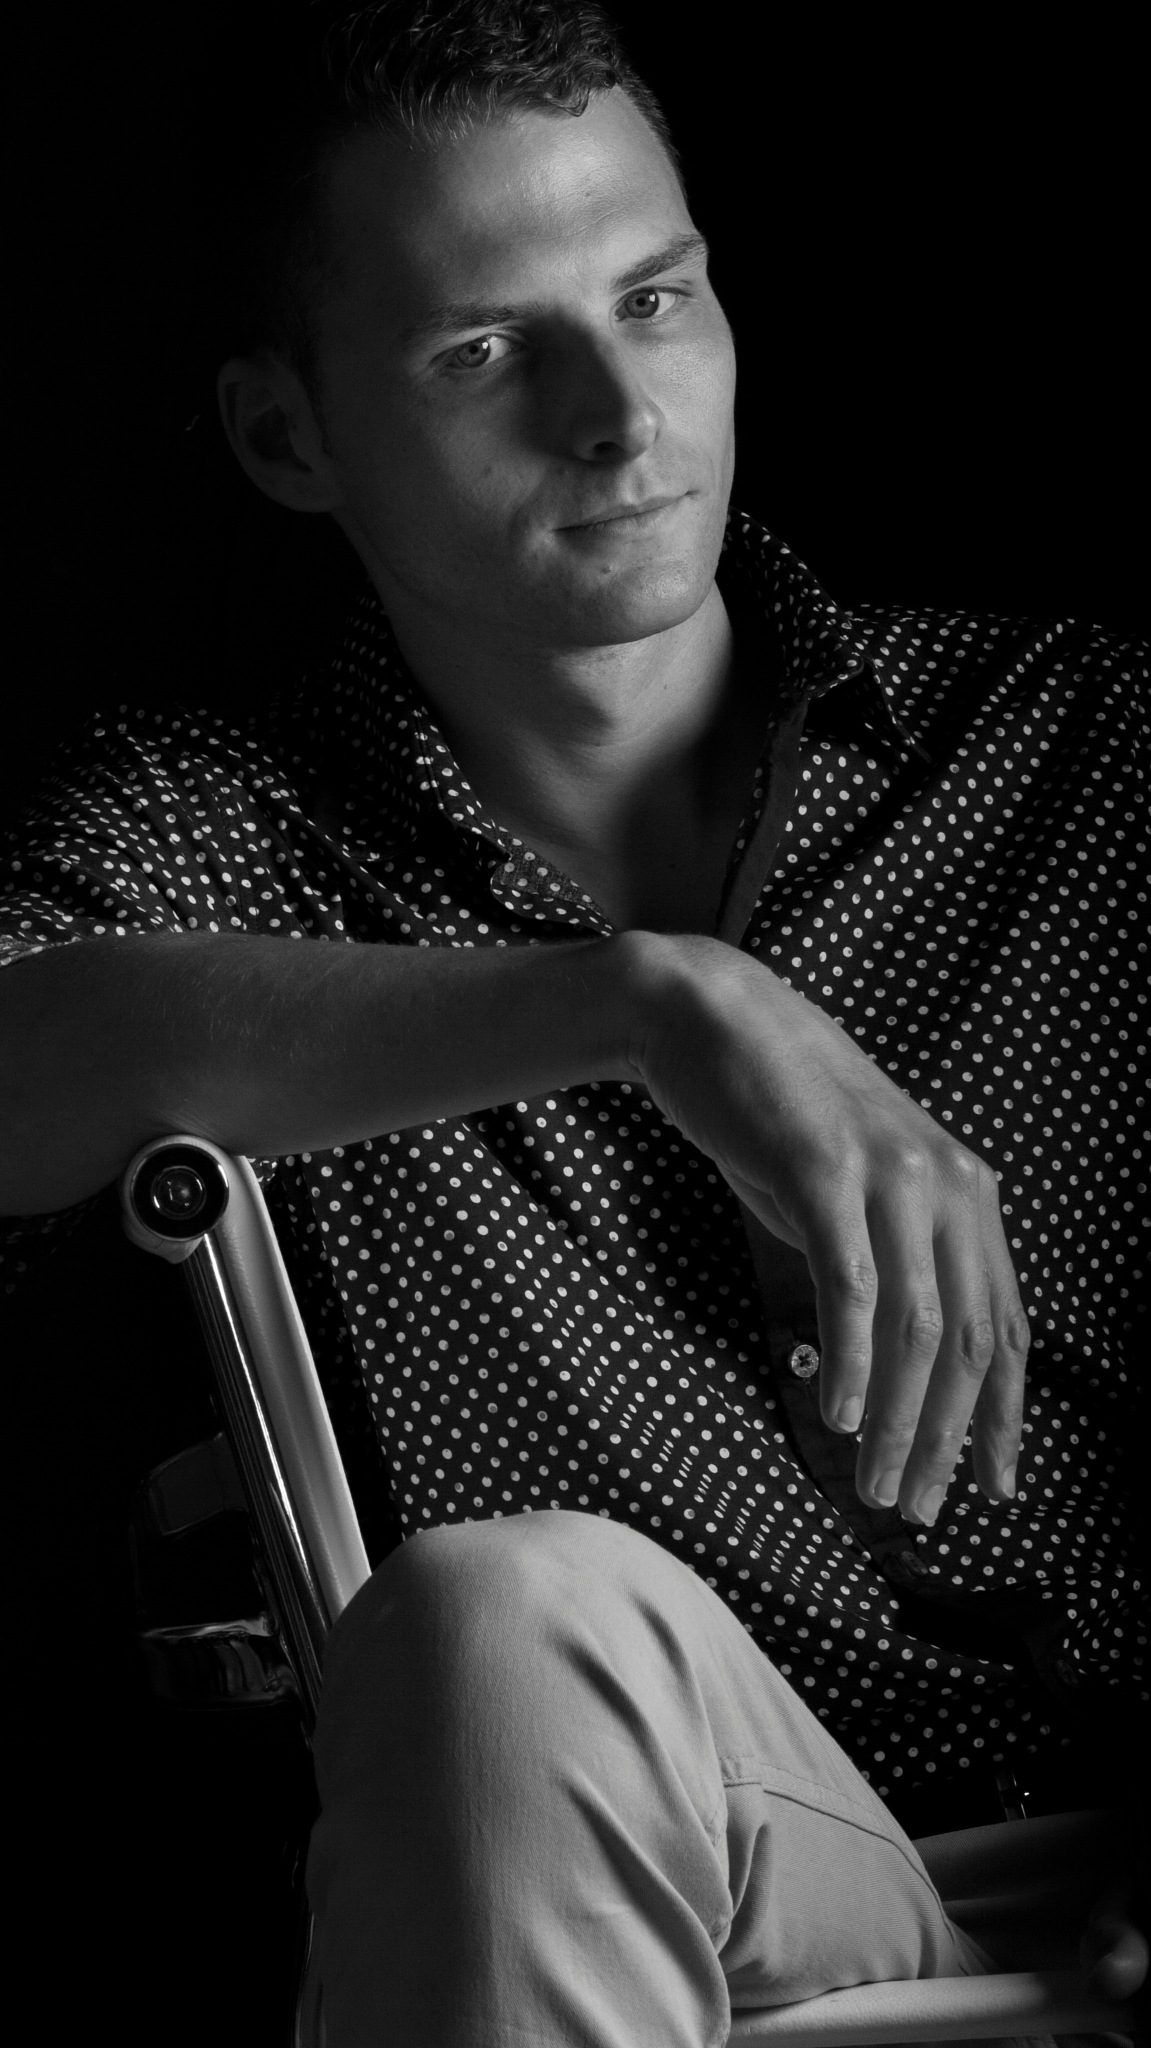 Man on a chair by roy.vanpeufflik